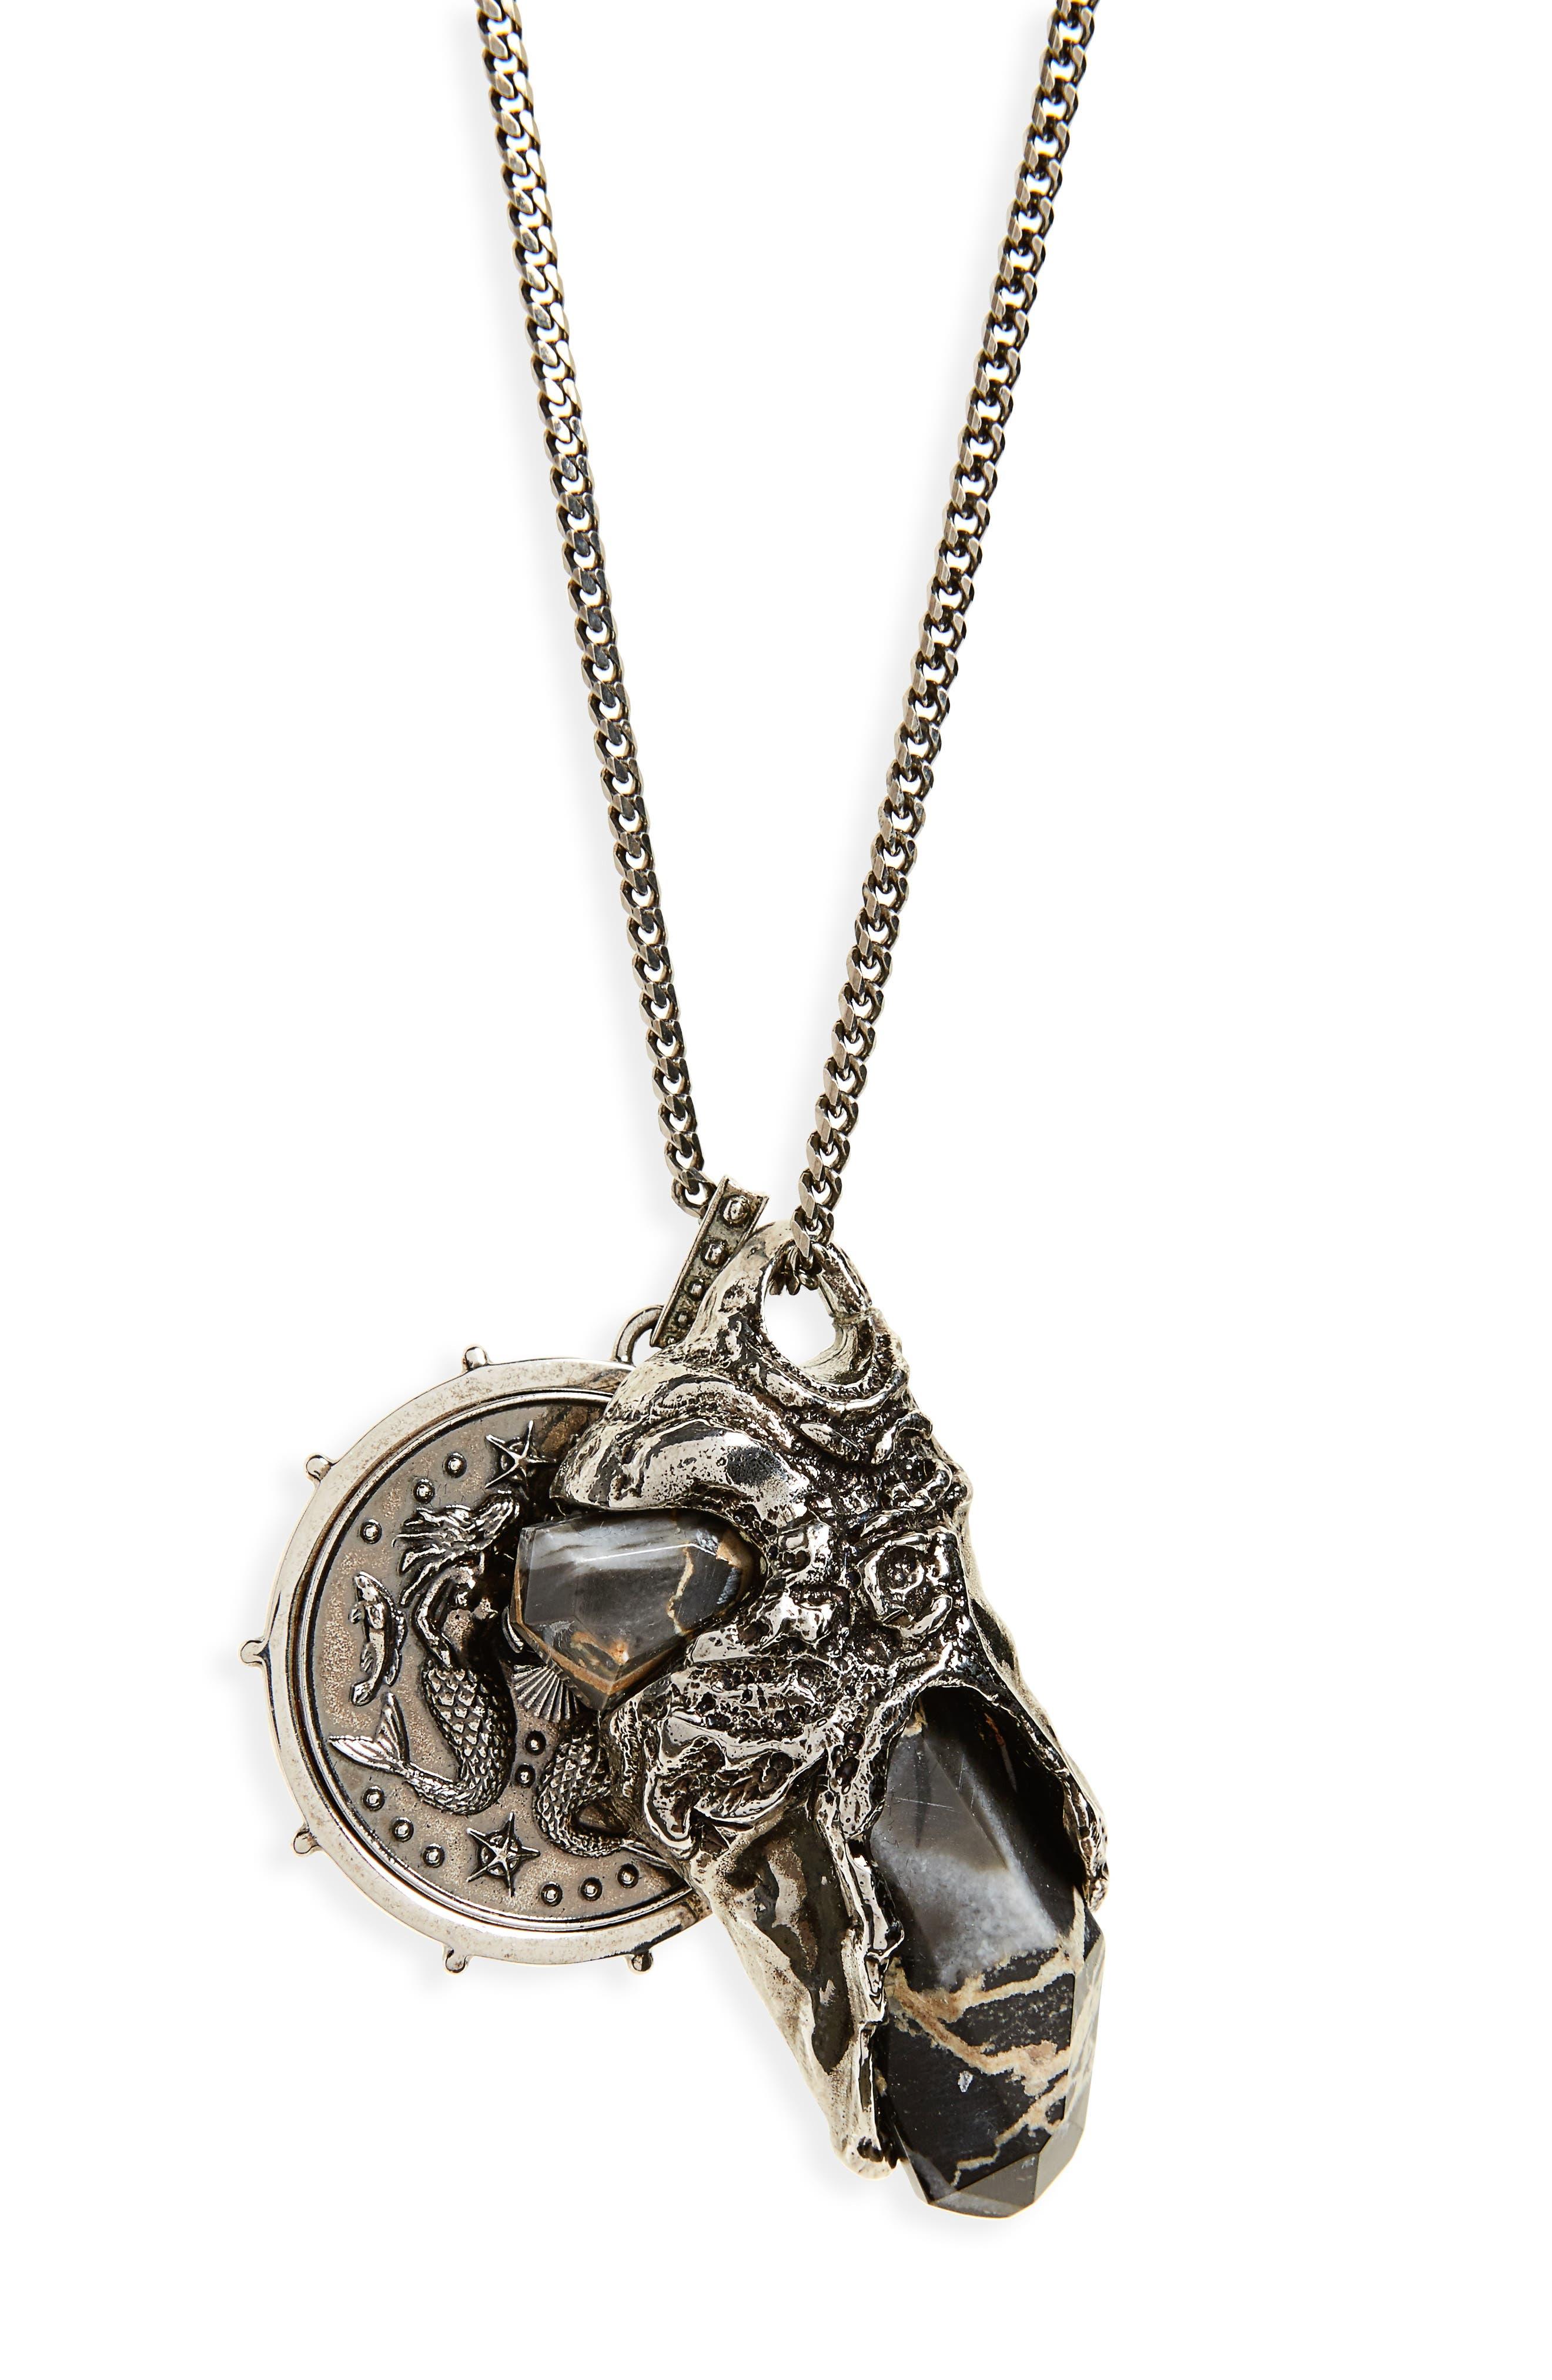 Medallion Pendant Necklace,                             Alternate thumbnail 2, color,                             ANTIQUE SILVER/ BLACK PORTORO